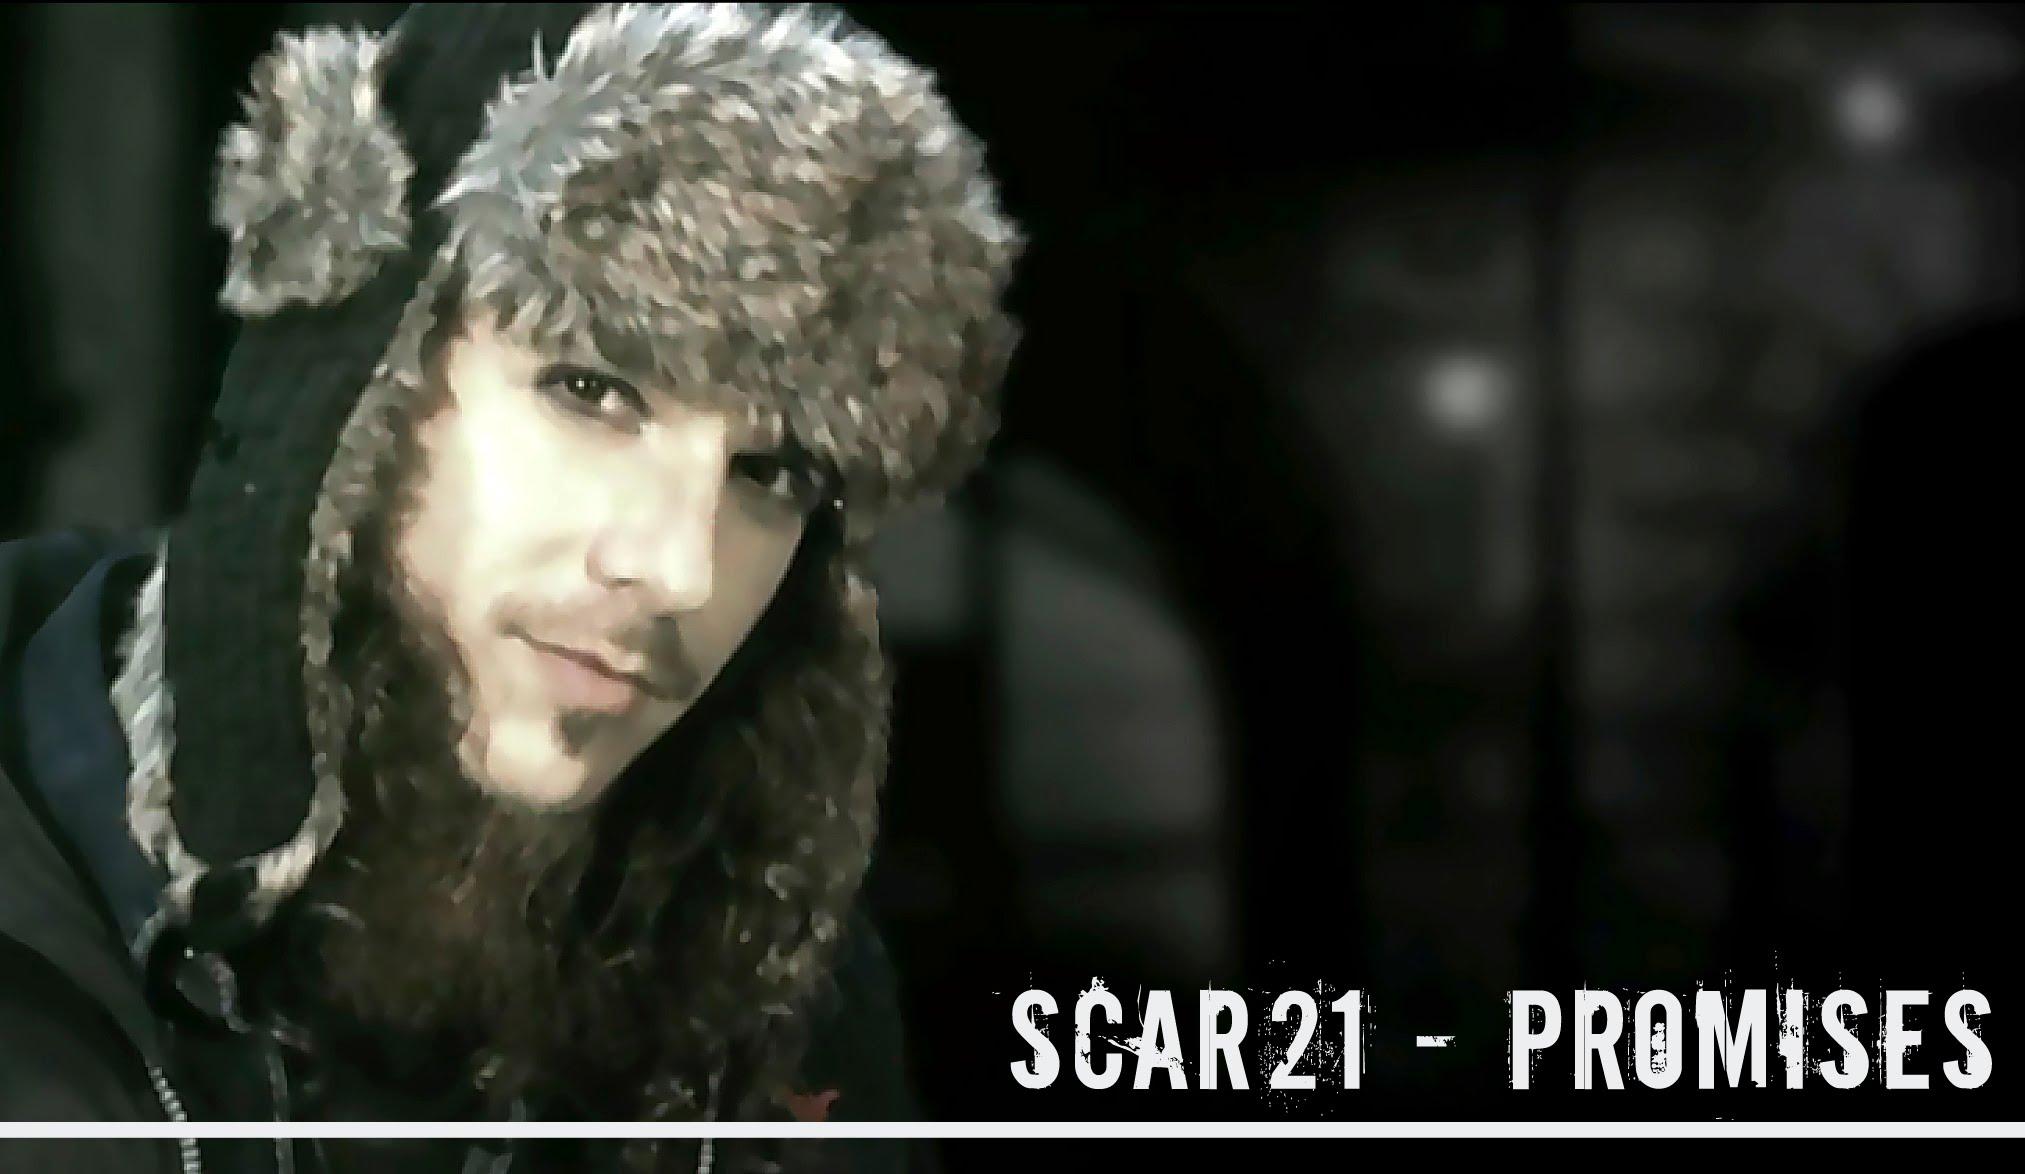 scar21 promises